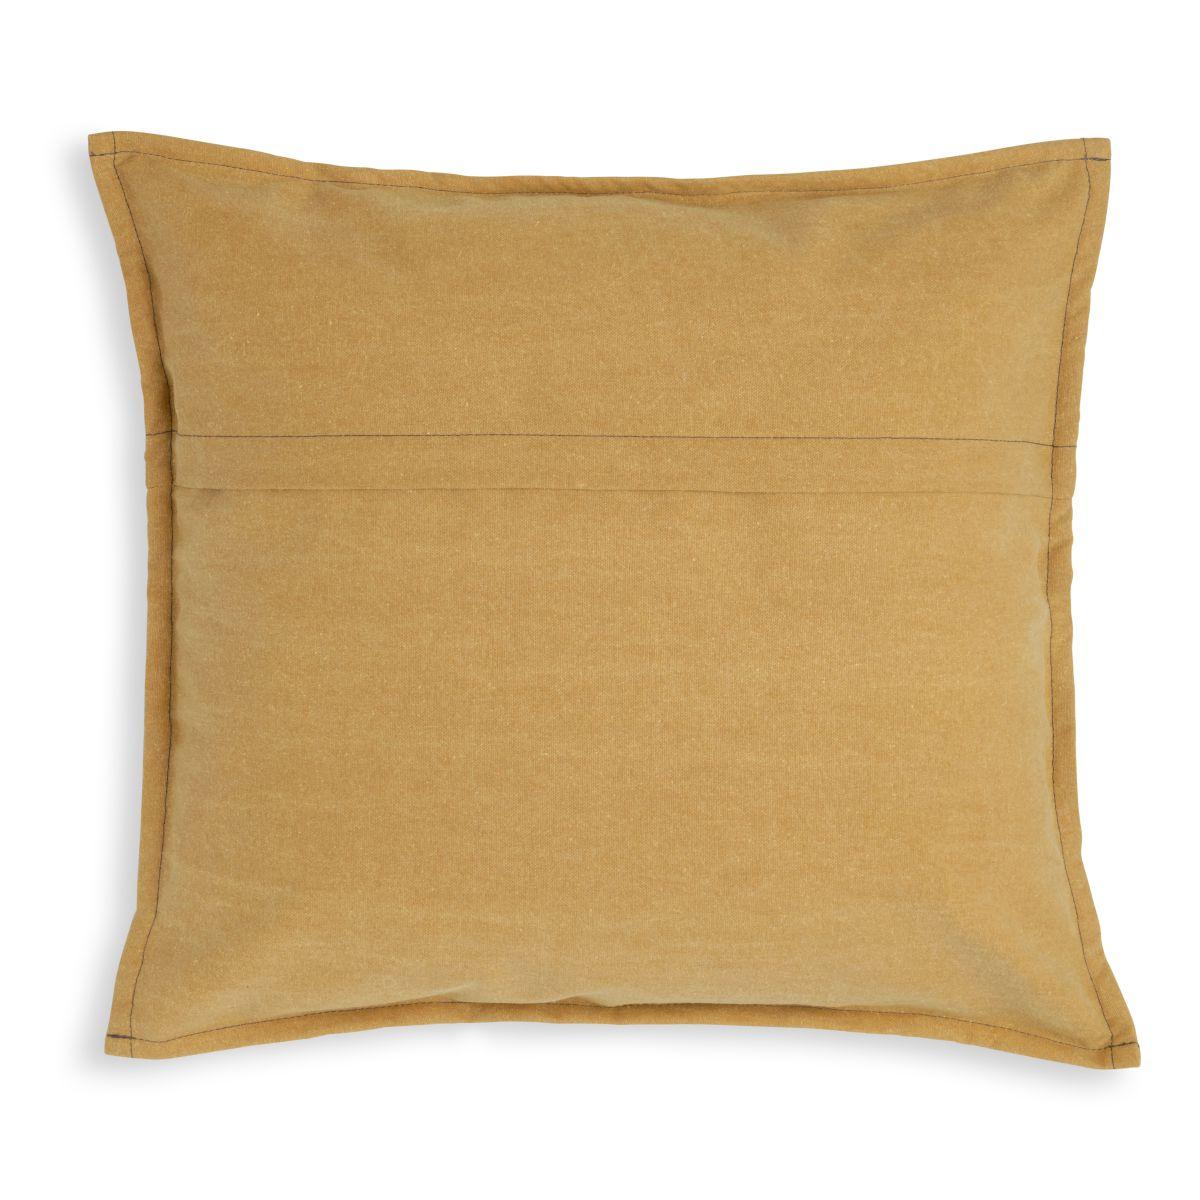 knit factory kf154012017 hope kussen oker 50x50 2